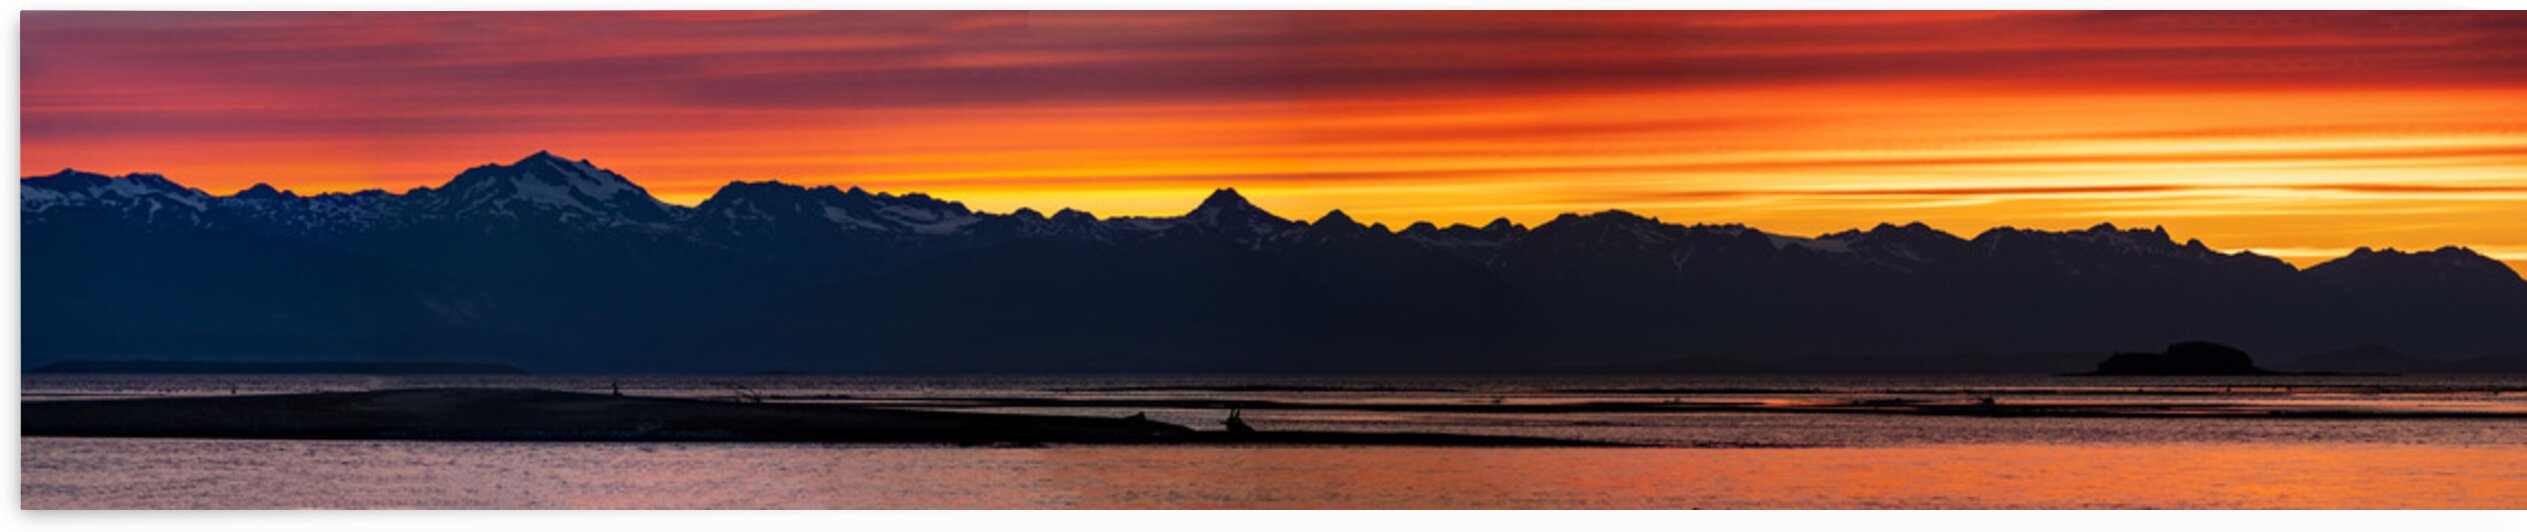 Sunset panorama 3 by Caleb Nagel